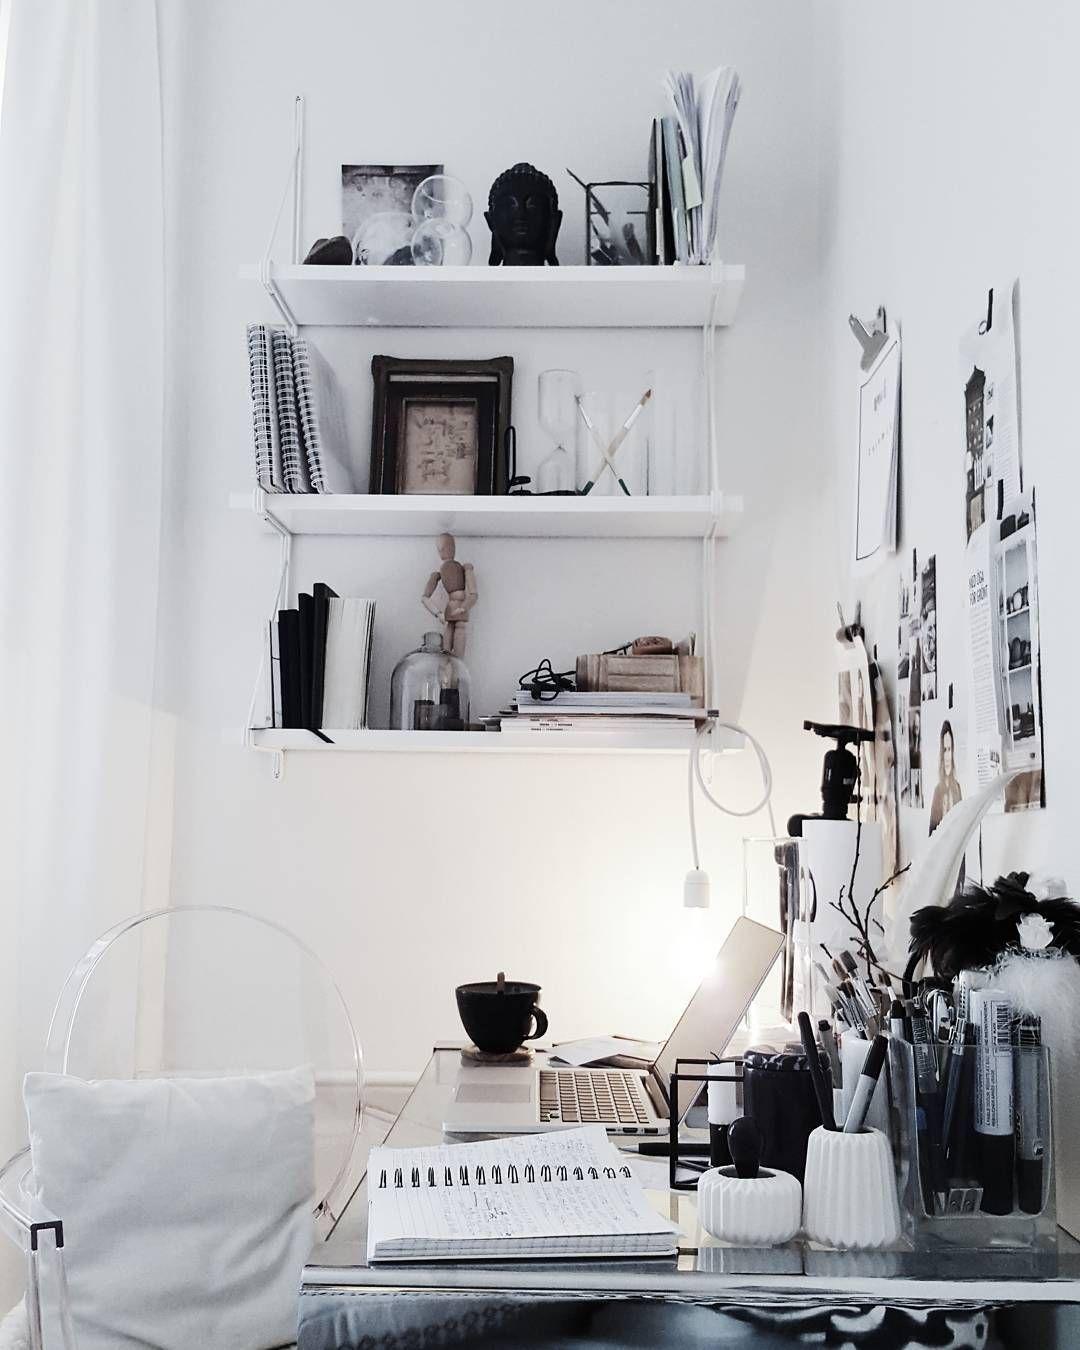 Bedroom Wall Rack Design Bedroom Cupboards Nz Elegant Bedrooms For Girls Bedroom Wall Art Canvas: Ikea 'Ekby/Gällö ' Wall Shelf